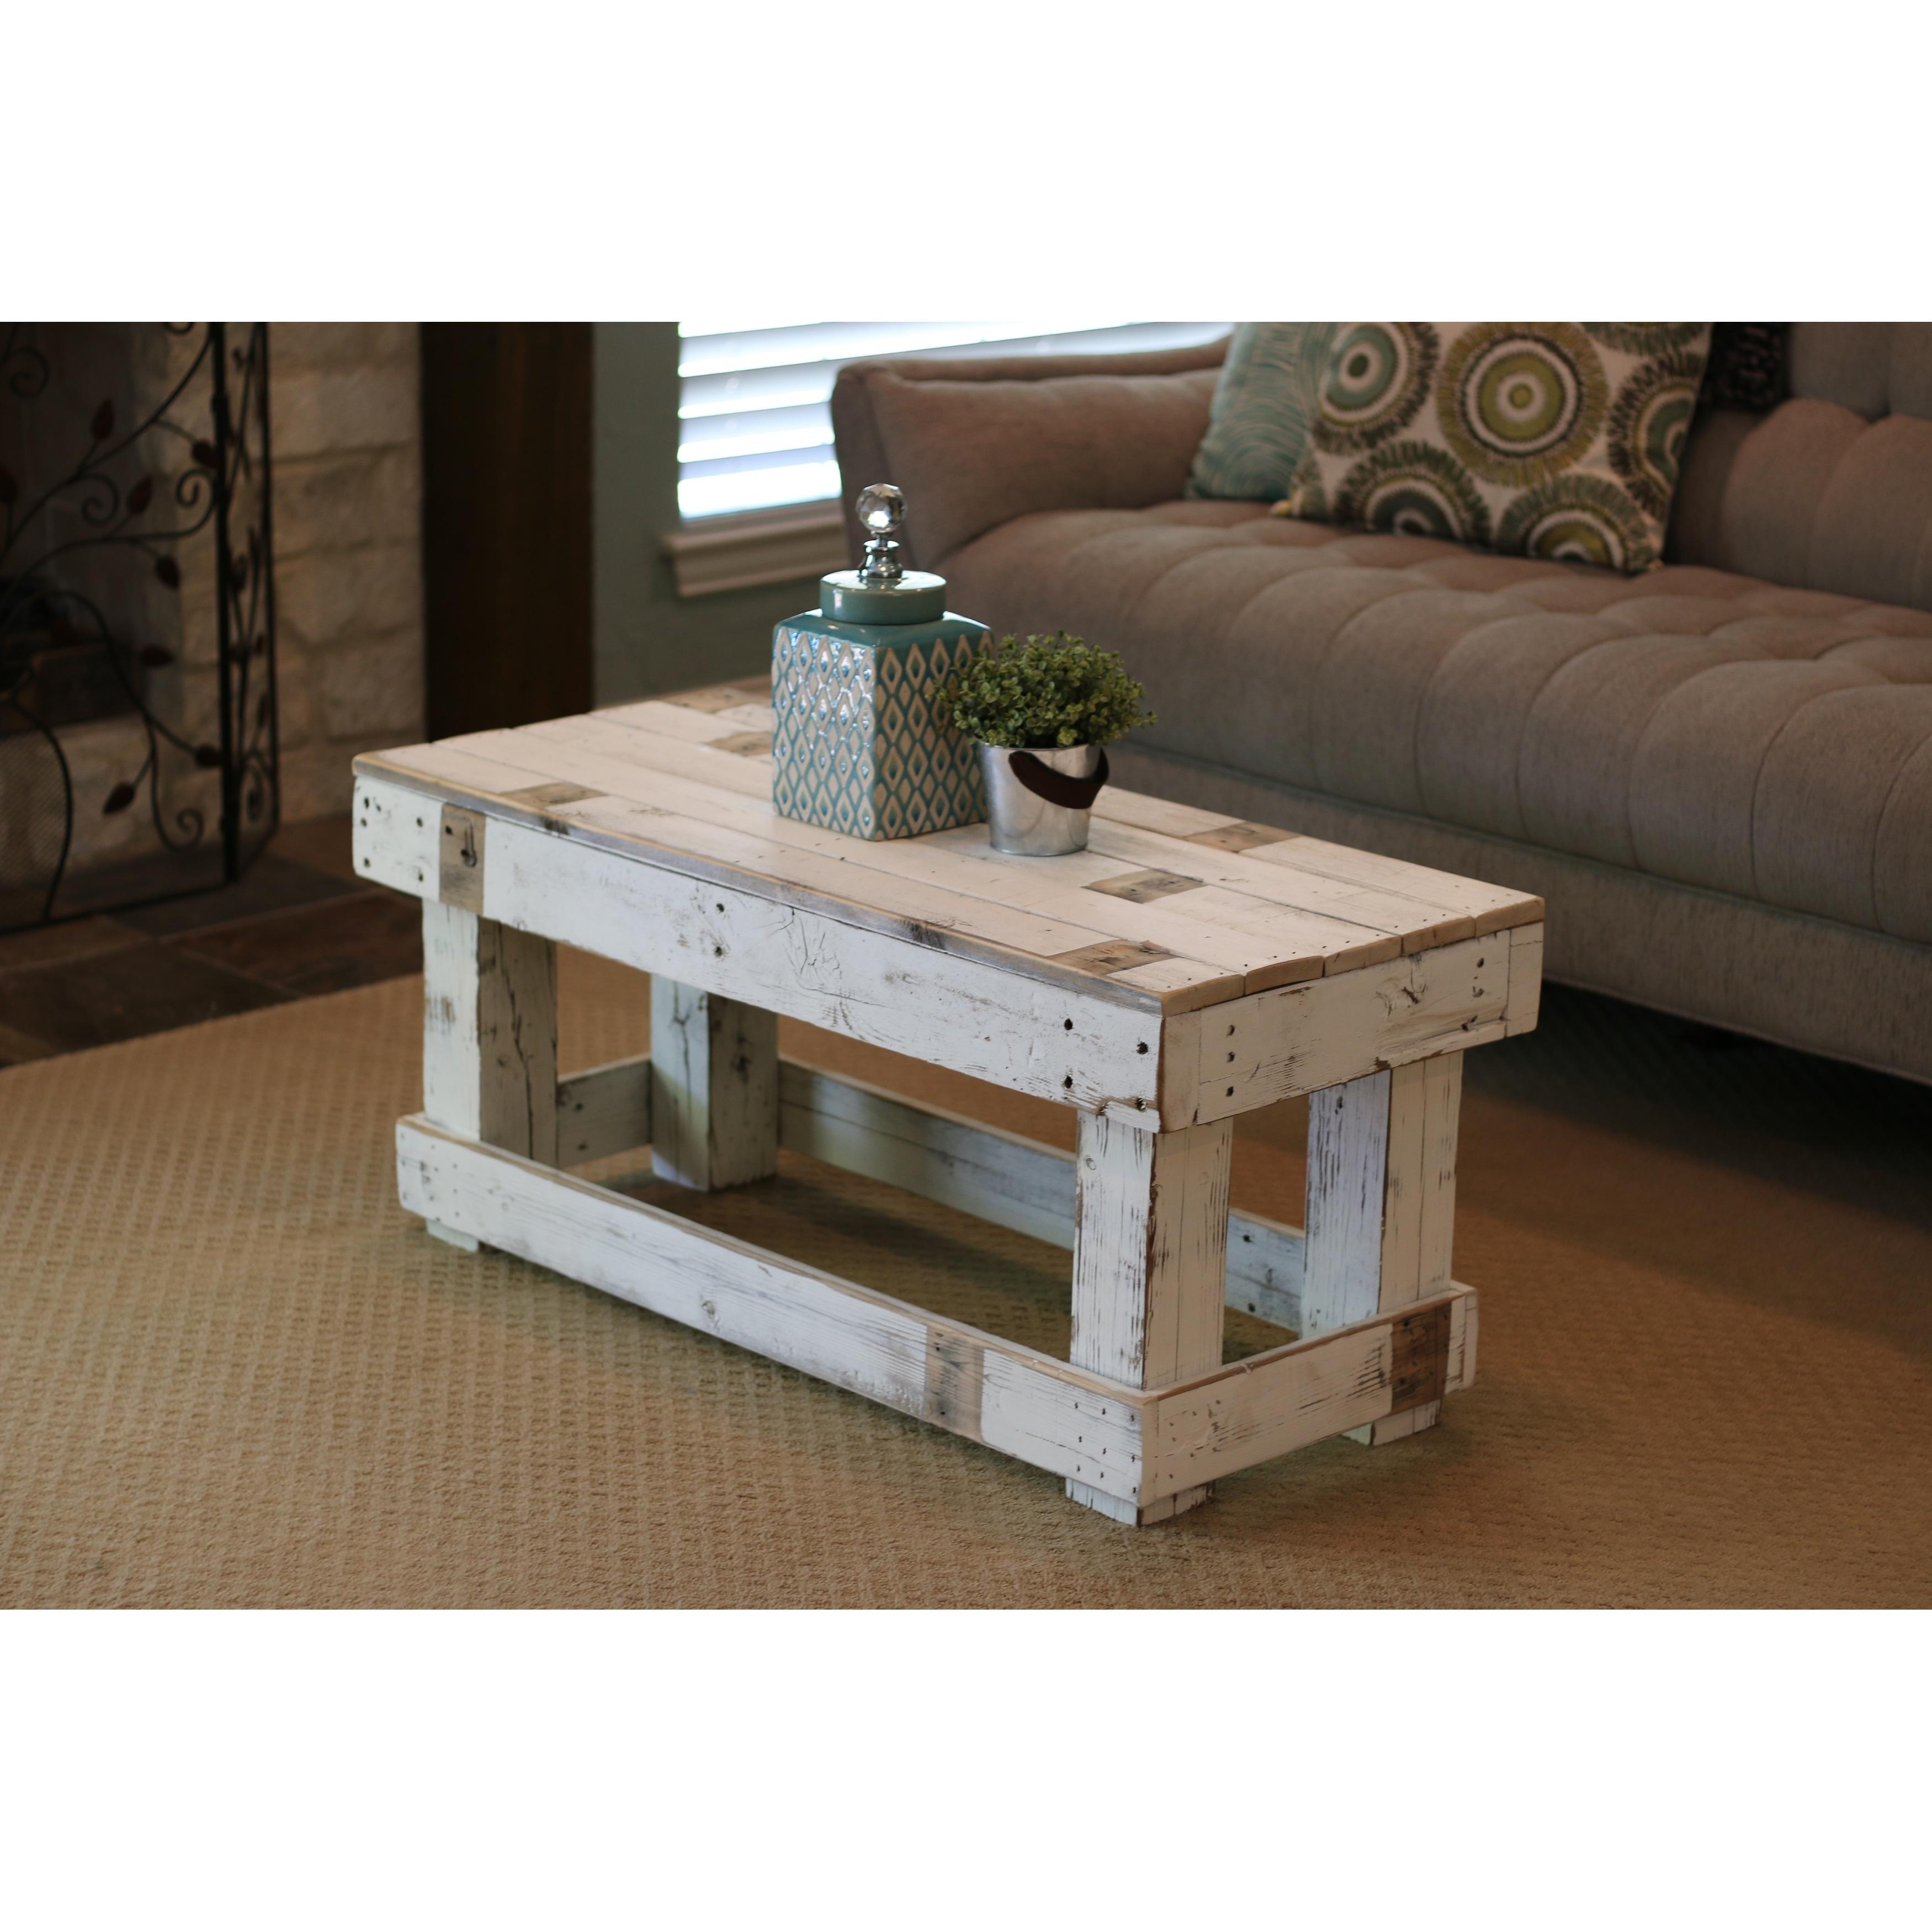 White Farmhouse Coffee Table Overstock 25602399